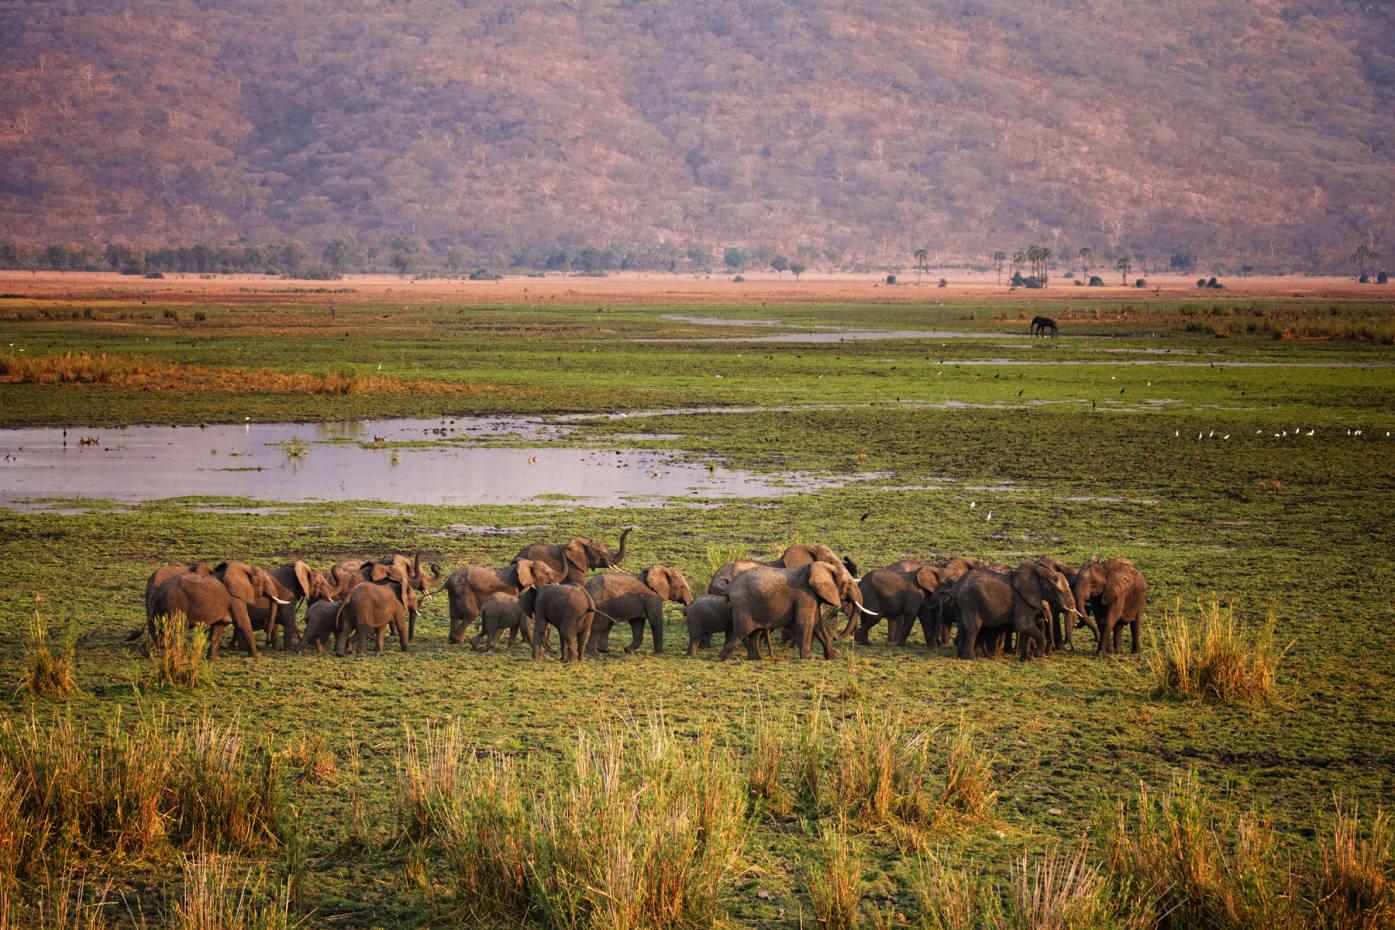 Elephants roam Liwonde National Park